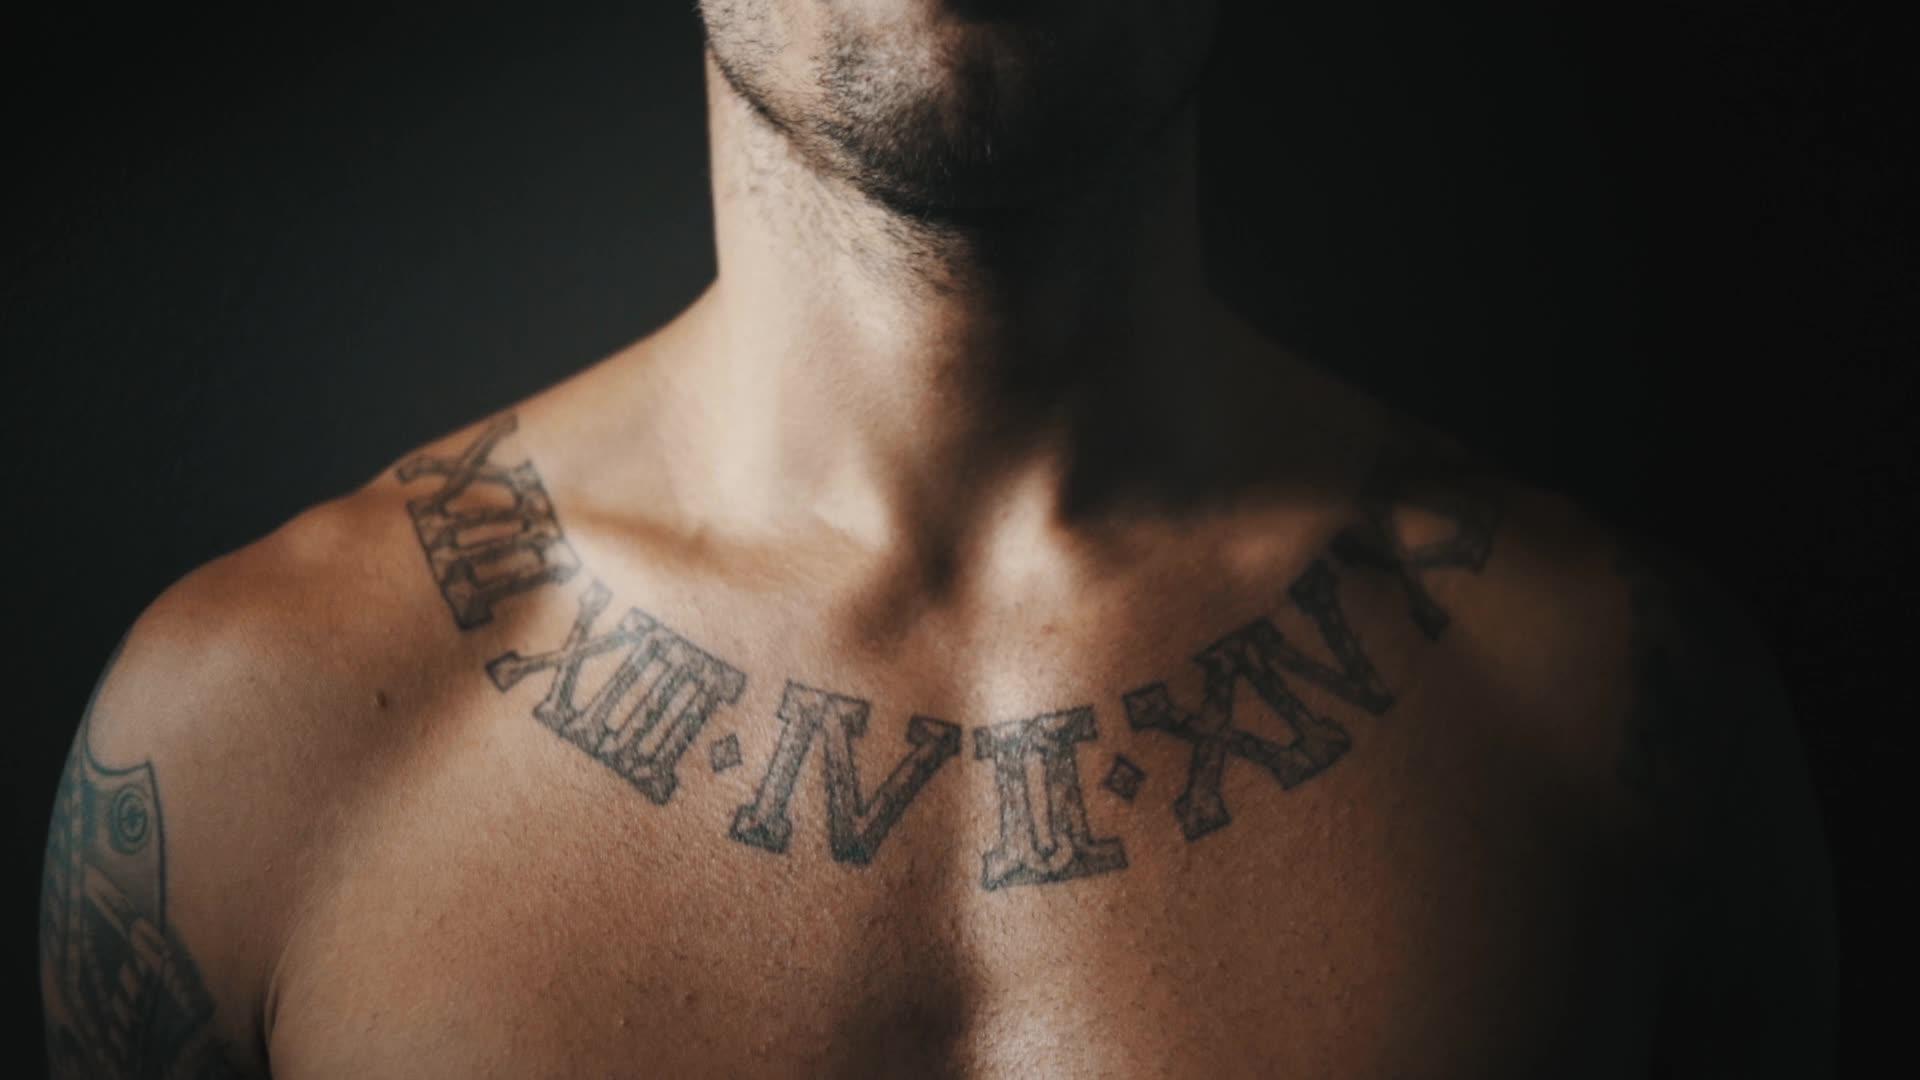 VOESLAUER_Tattoos_Fabian_YT_MASTER_1295